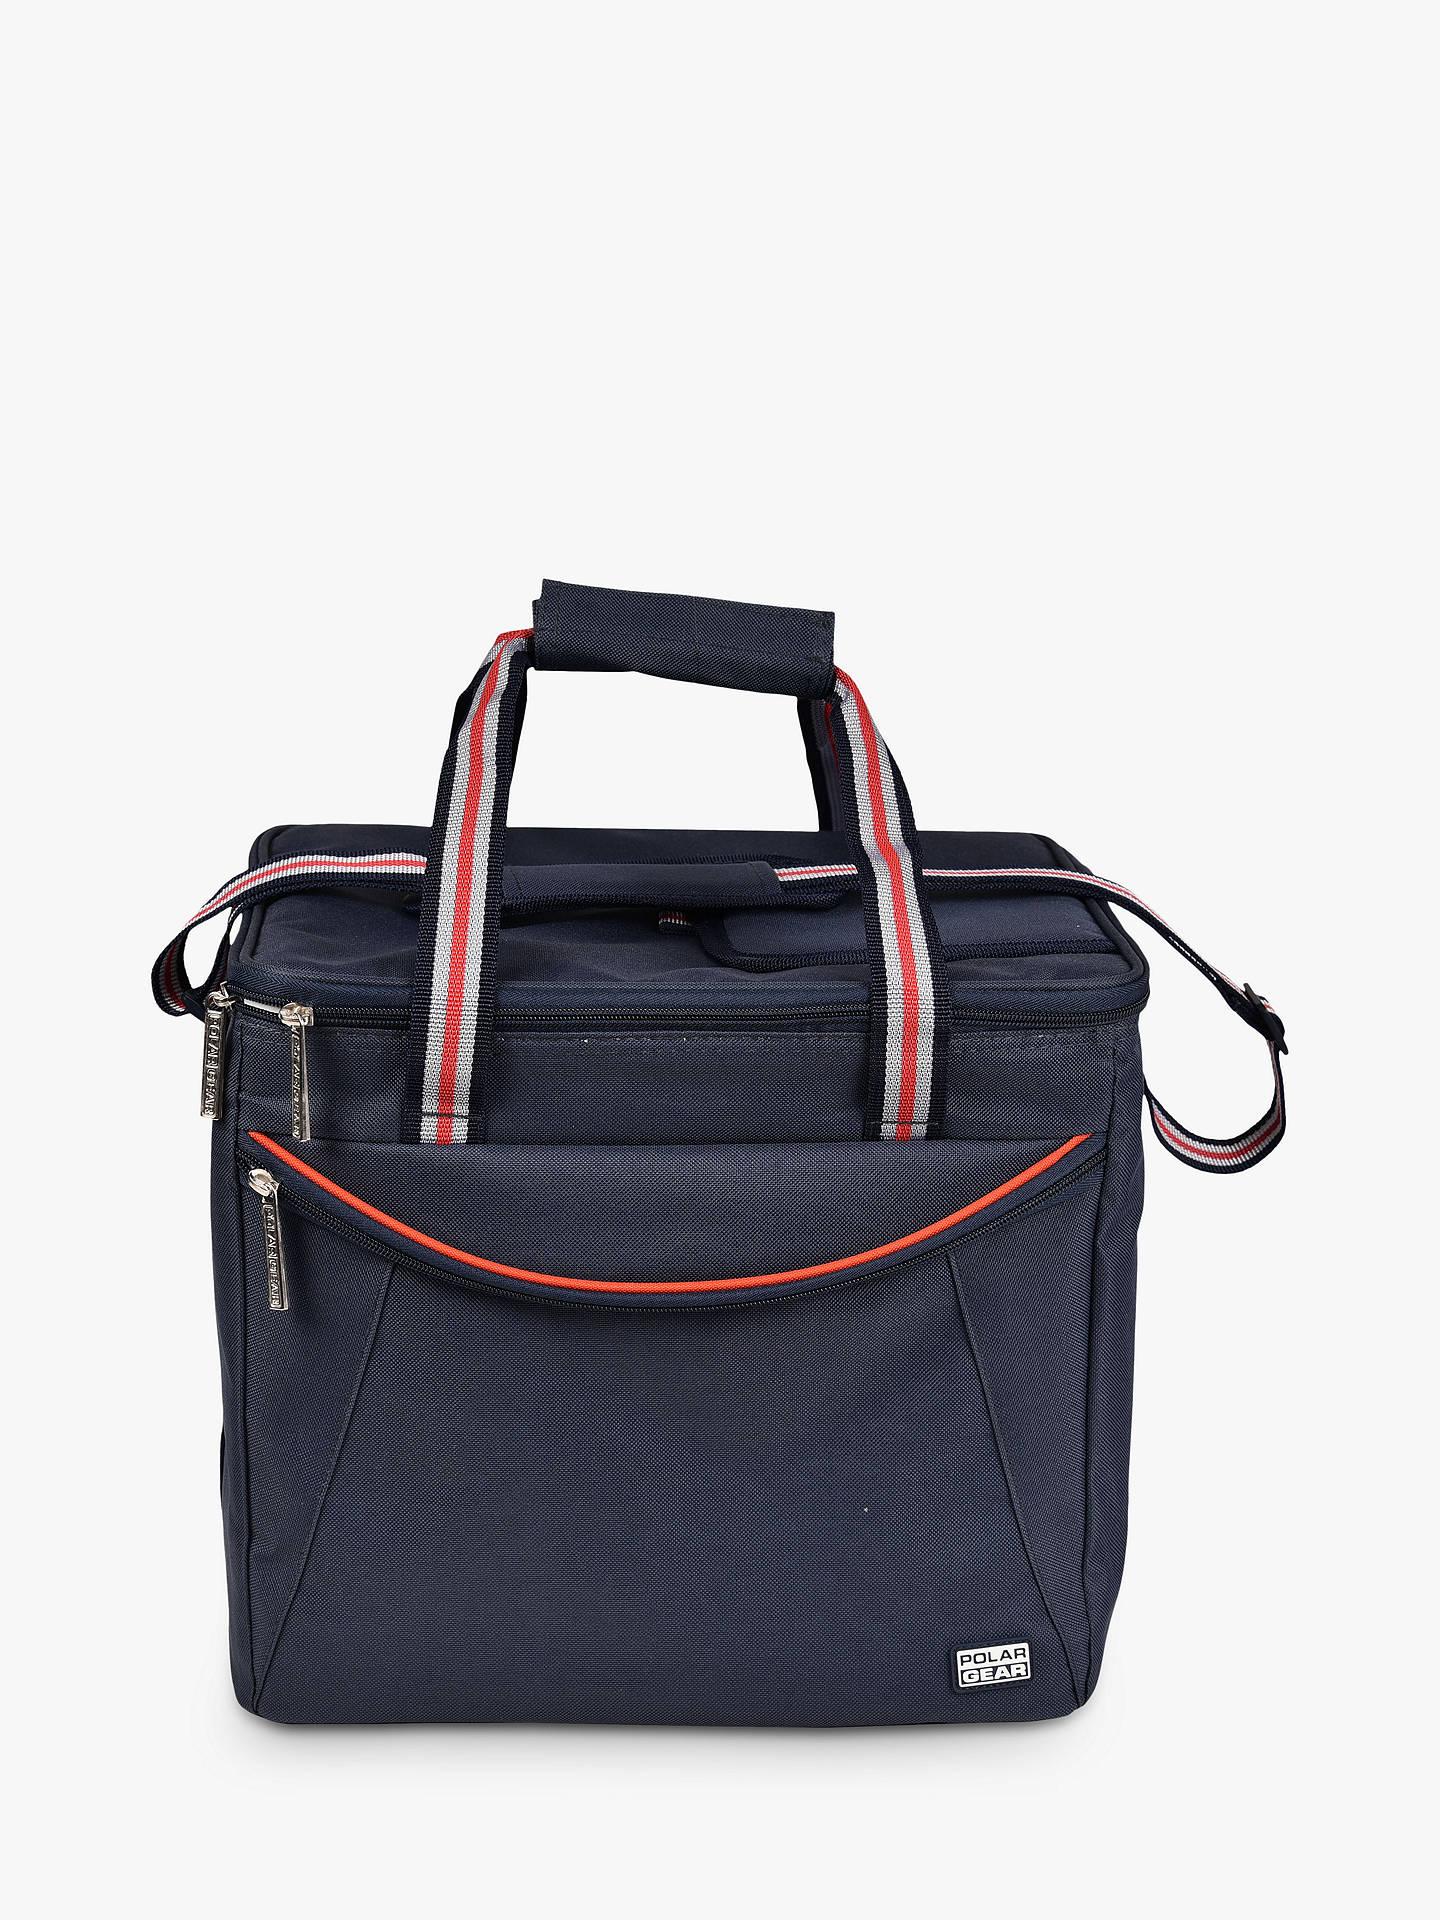 ac08abf586 Polar Gear Premium Family Cooler Bag, 30L